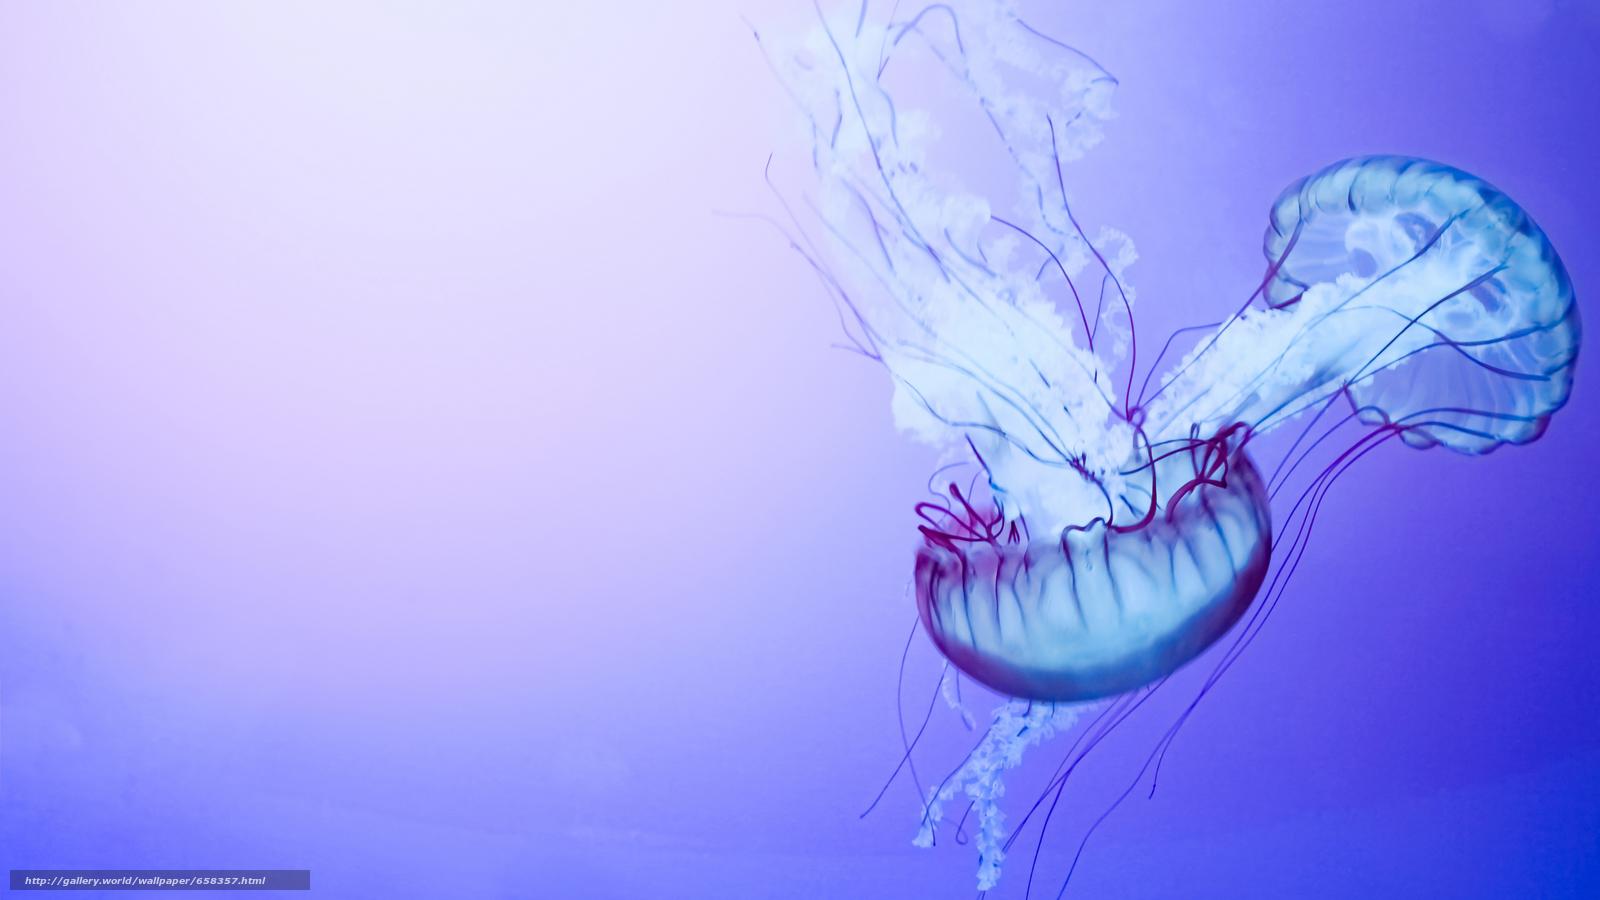 Descargar gratis medusa,  Medusa,  Mundial de Actividades Subacuáticas,  agua Fondos de escritorio en la resolucin 5000x2812 — imagen №658357